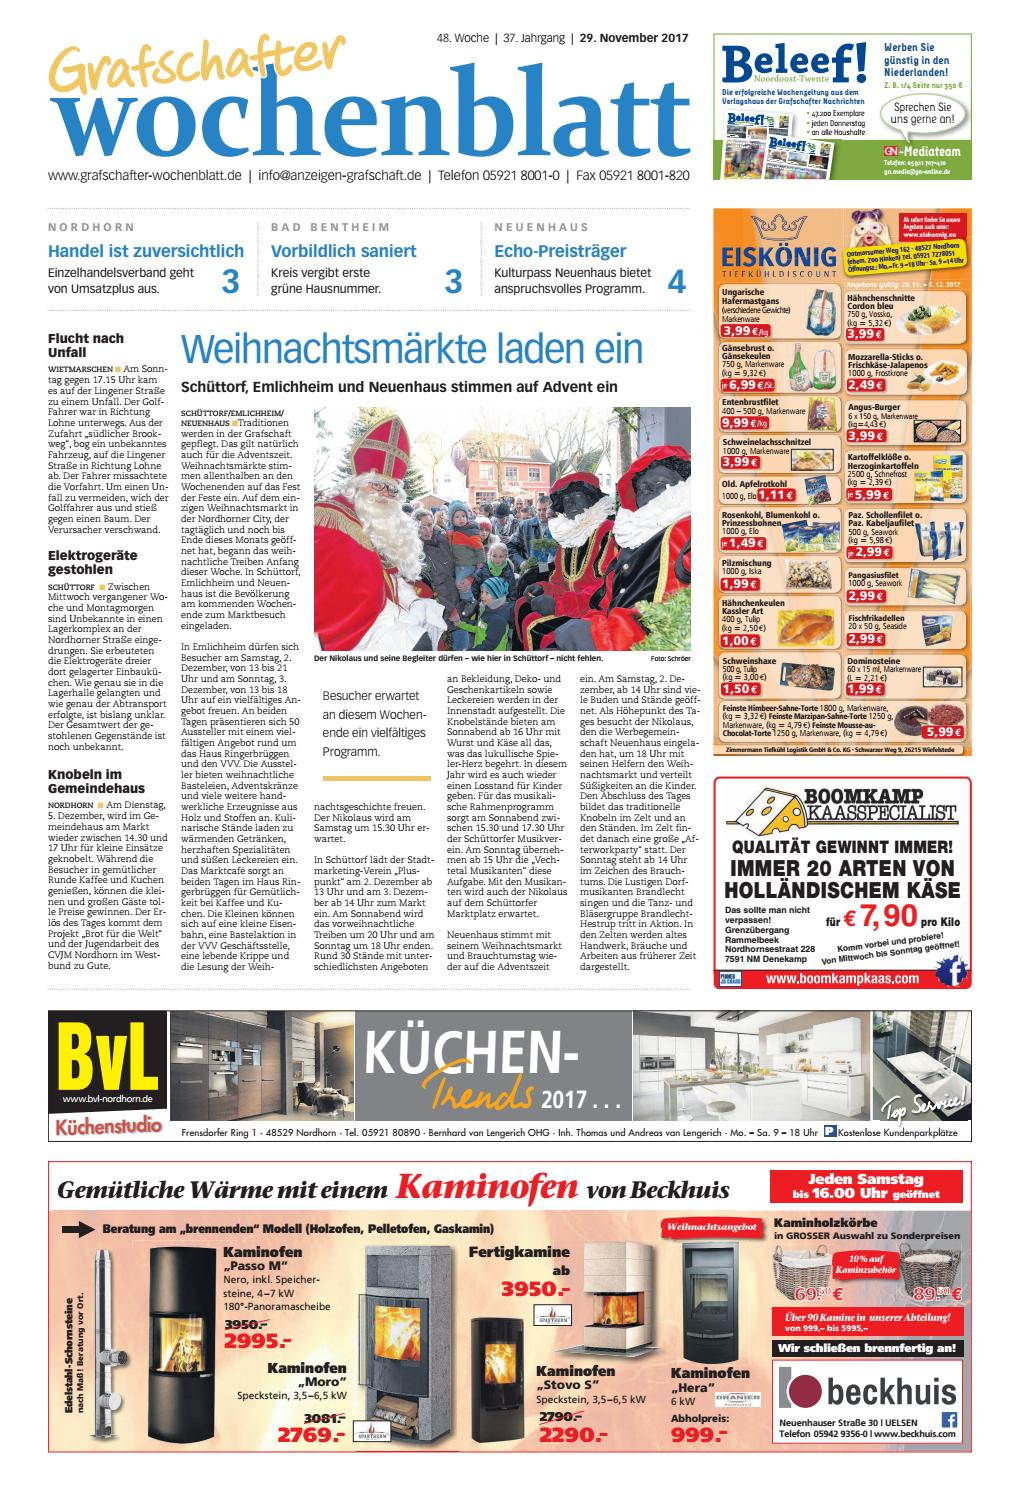 Grafschafter Wochenblatt_29-11-2017 by SonntagsZeitung - issuu